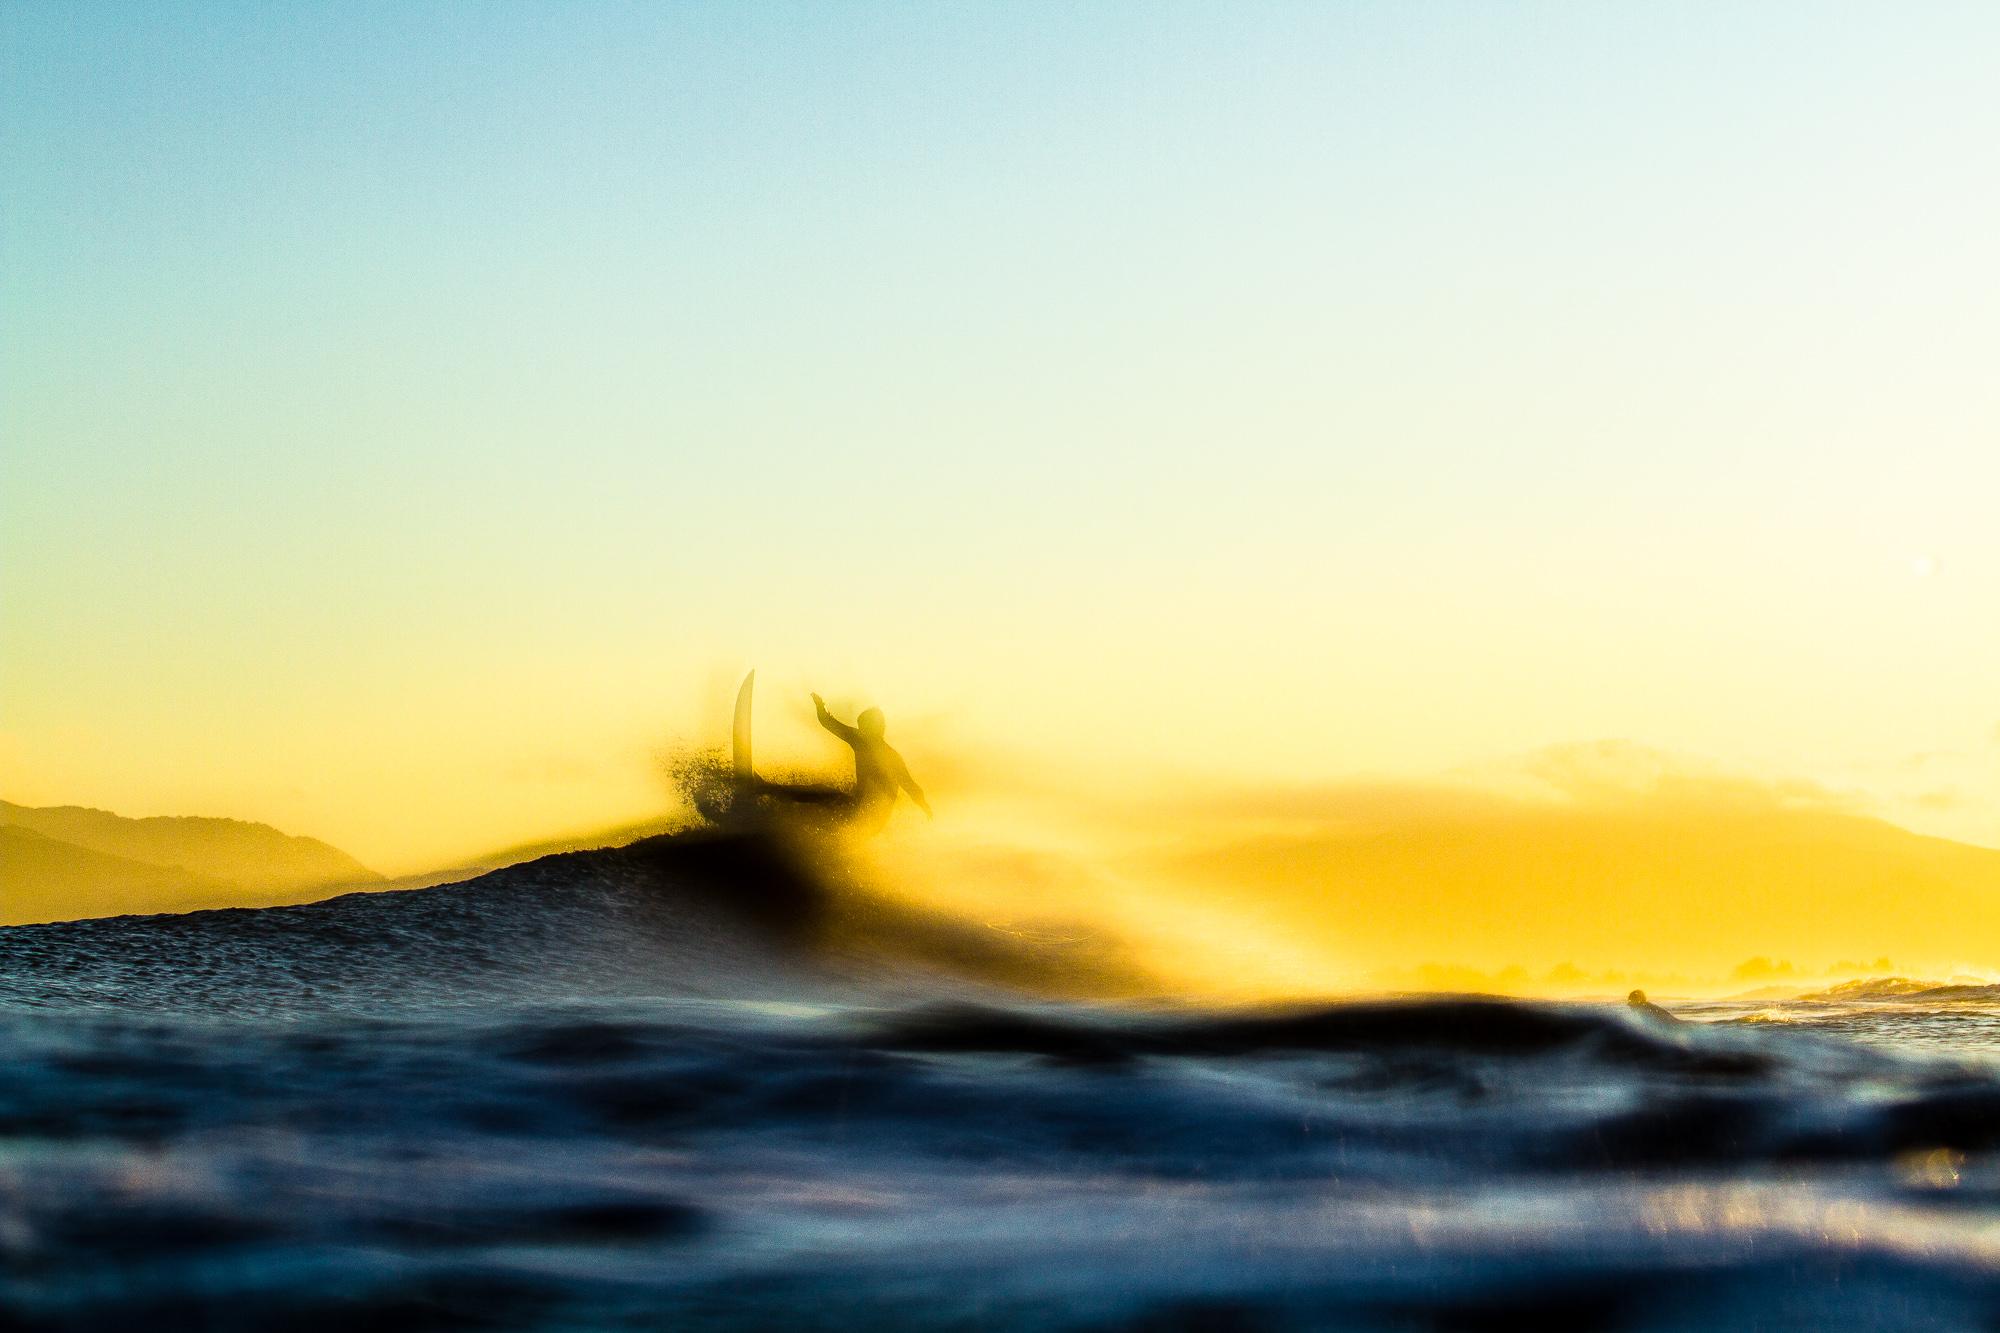 Foto 2 - Blur - Guarda do Embaú - Foto William Zimmermann.jpg